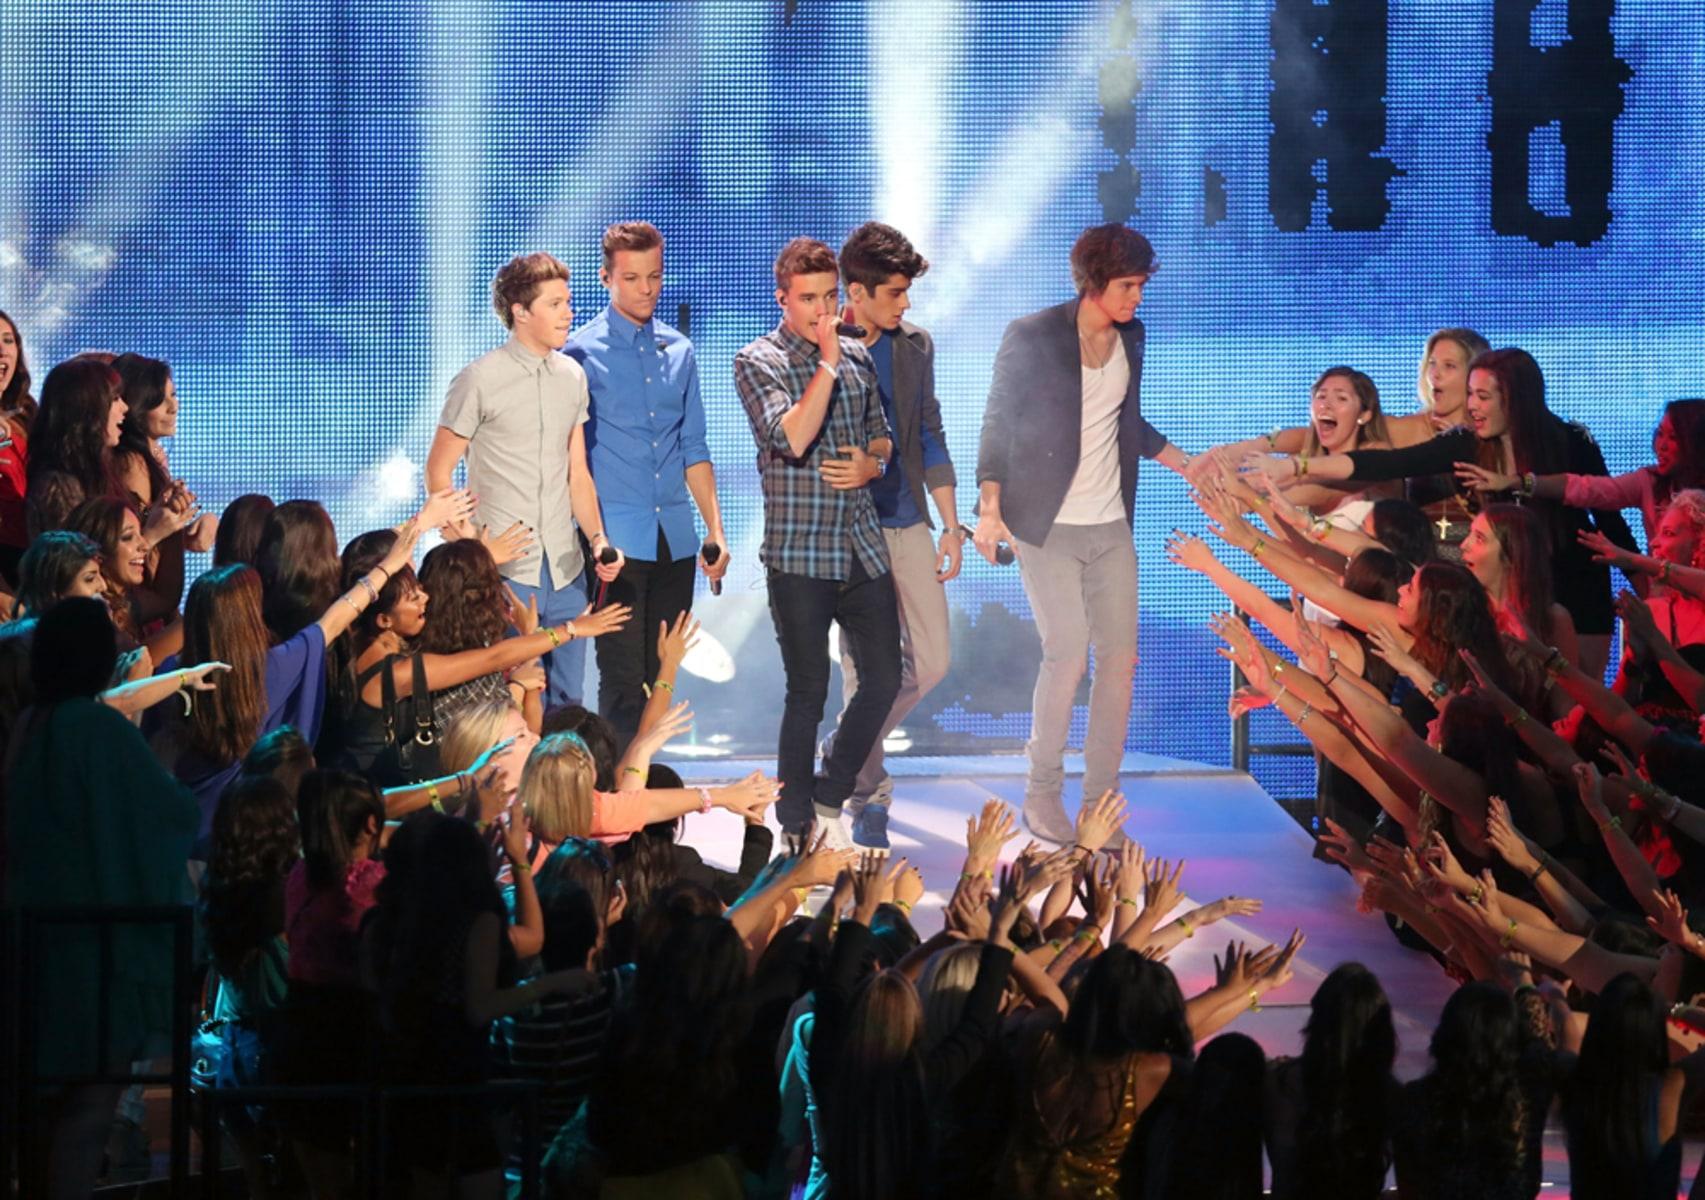 Image: 2012 MTV Video Music Awards - Show